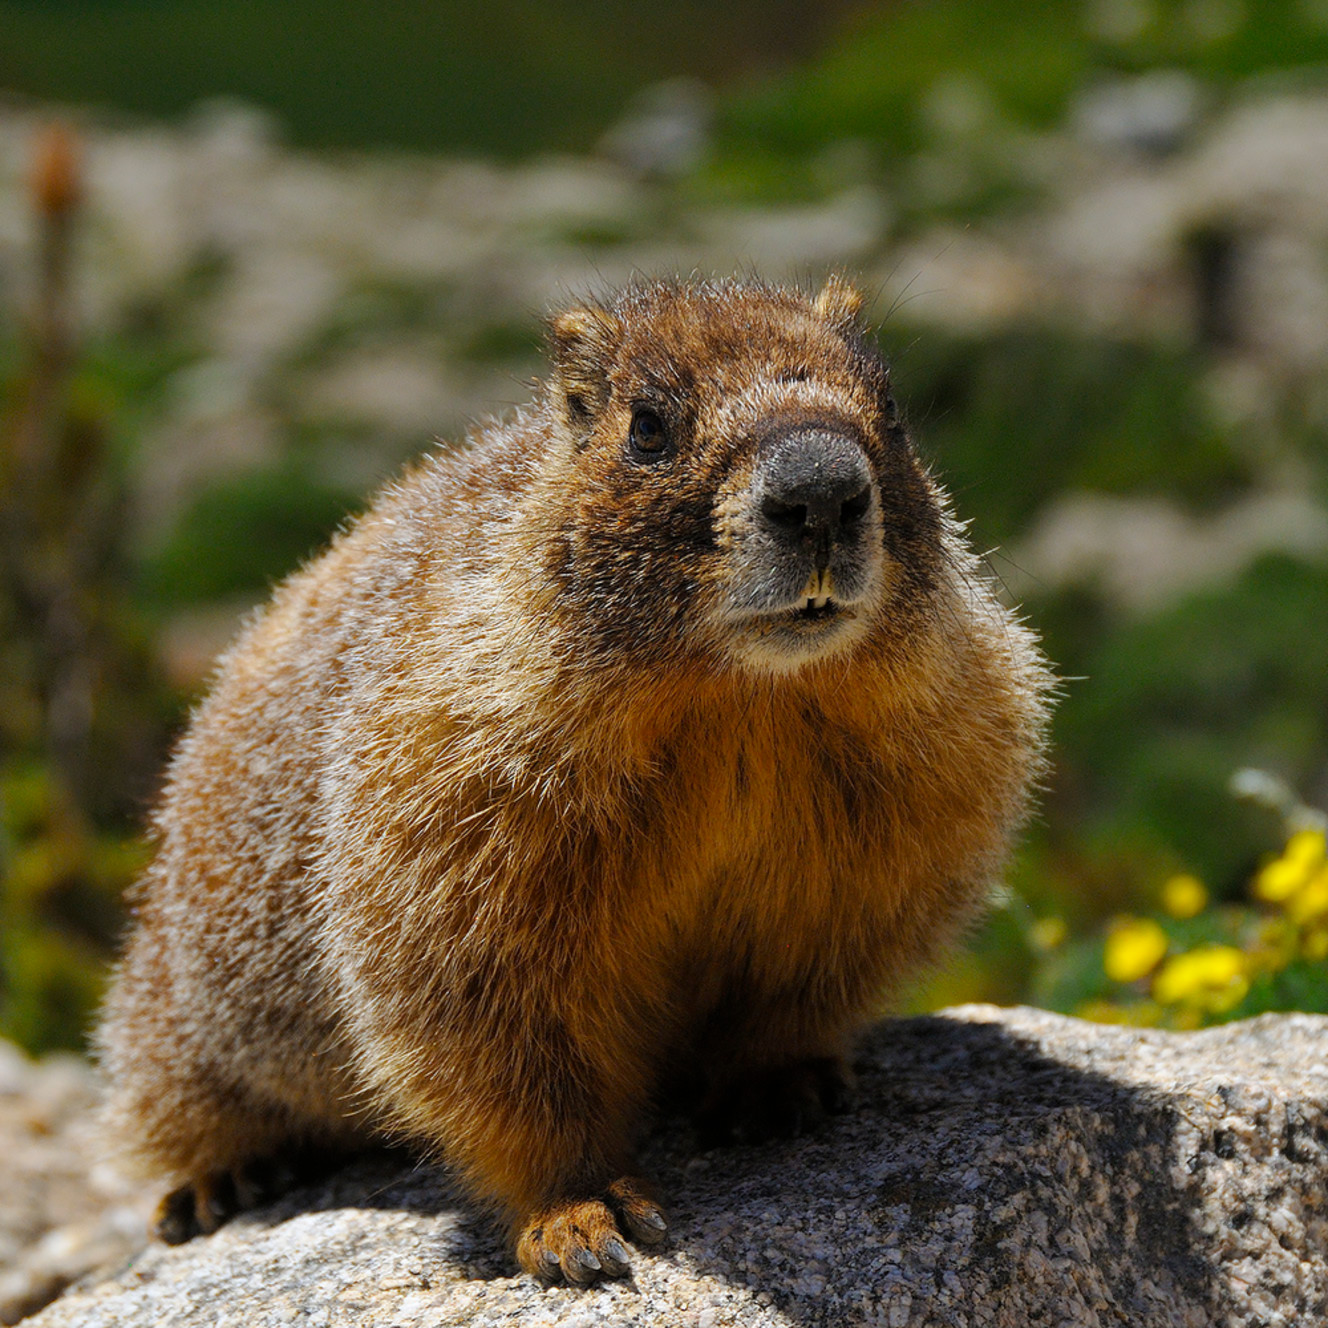 Yellow bellied marmot 2 l9svqo